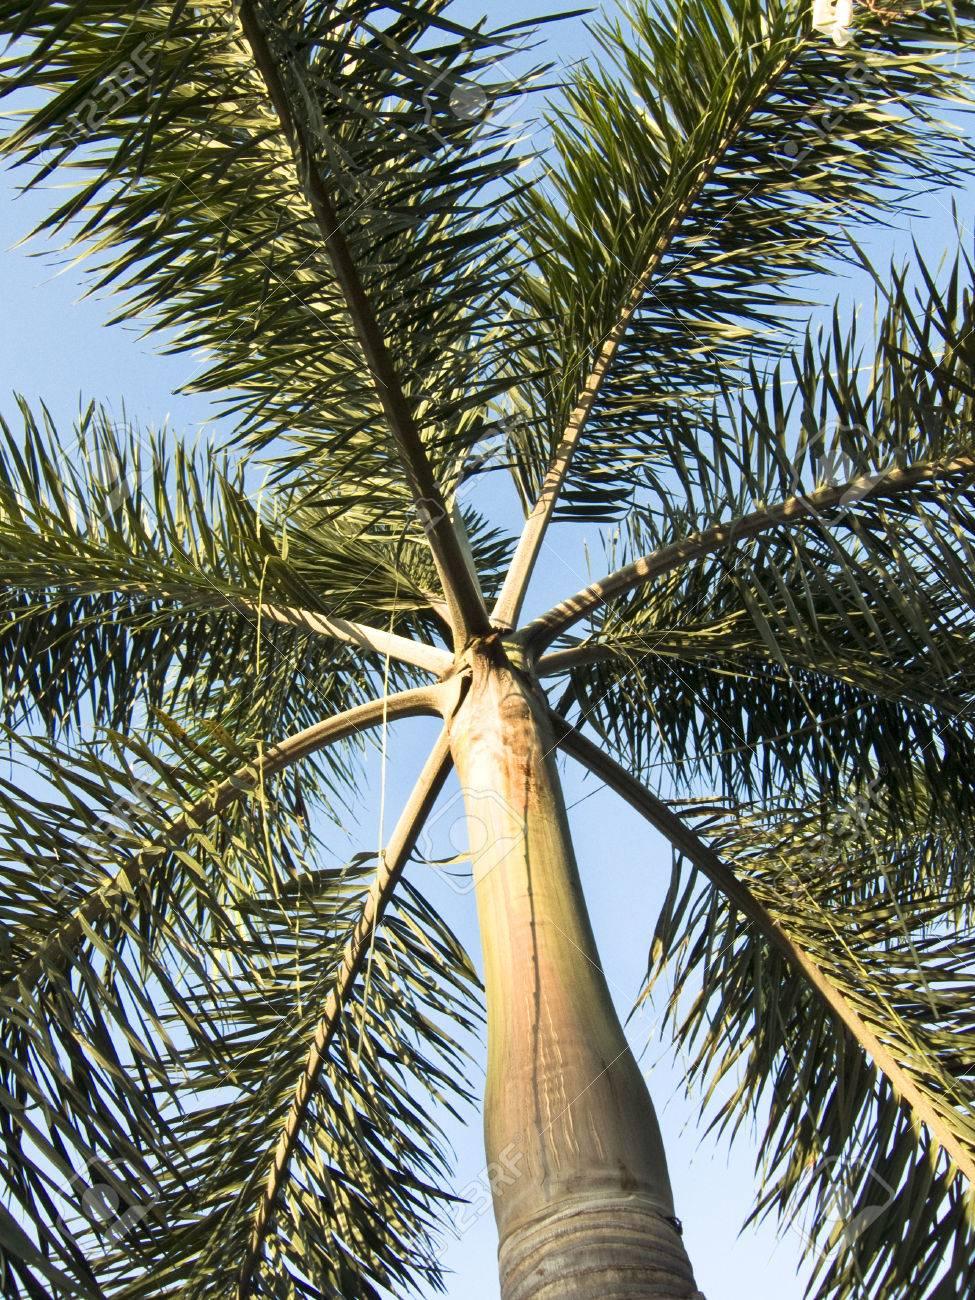 Pristine A Foxtail Palm Tree Or Wodyetia Bifurcata Irvine Er Up Foxtail Palm Tree Home Depot Foxtail Palm Tree C Hardiness Foxtail Palm Tree Or Wodyetia Bifurcata Irvine Er Up Into Bluesky houzz-02 Foxtail Palm Tree